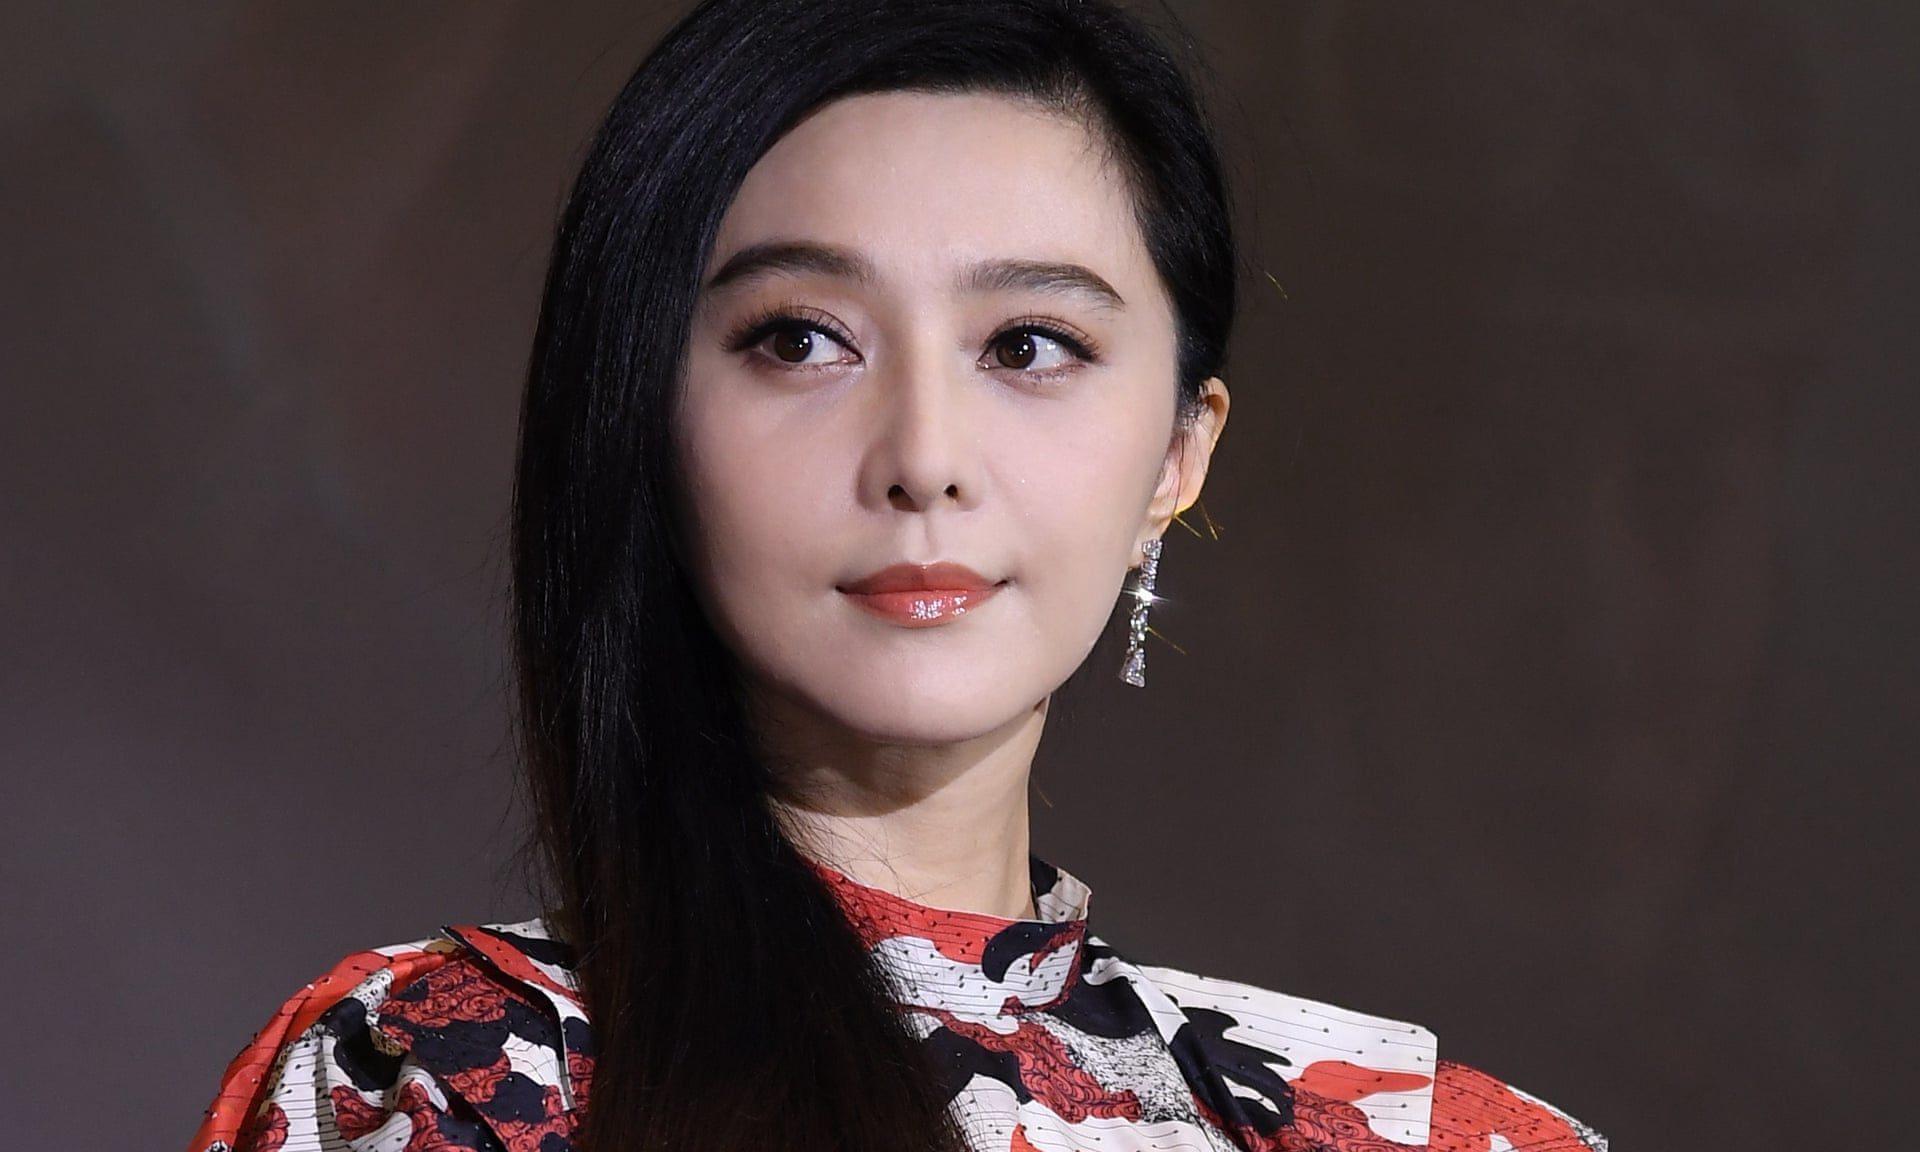 man-chinese-women-movie-stars-big-cock-latinas